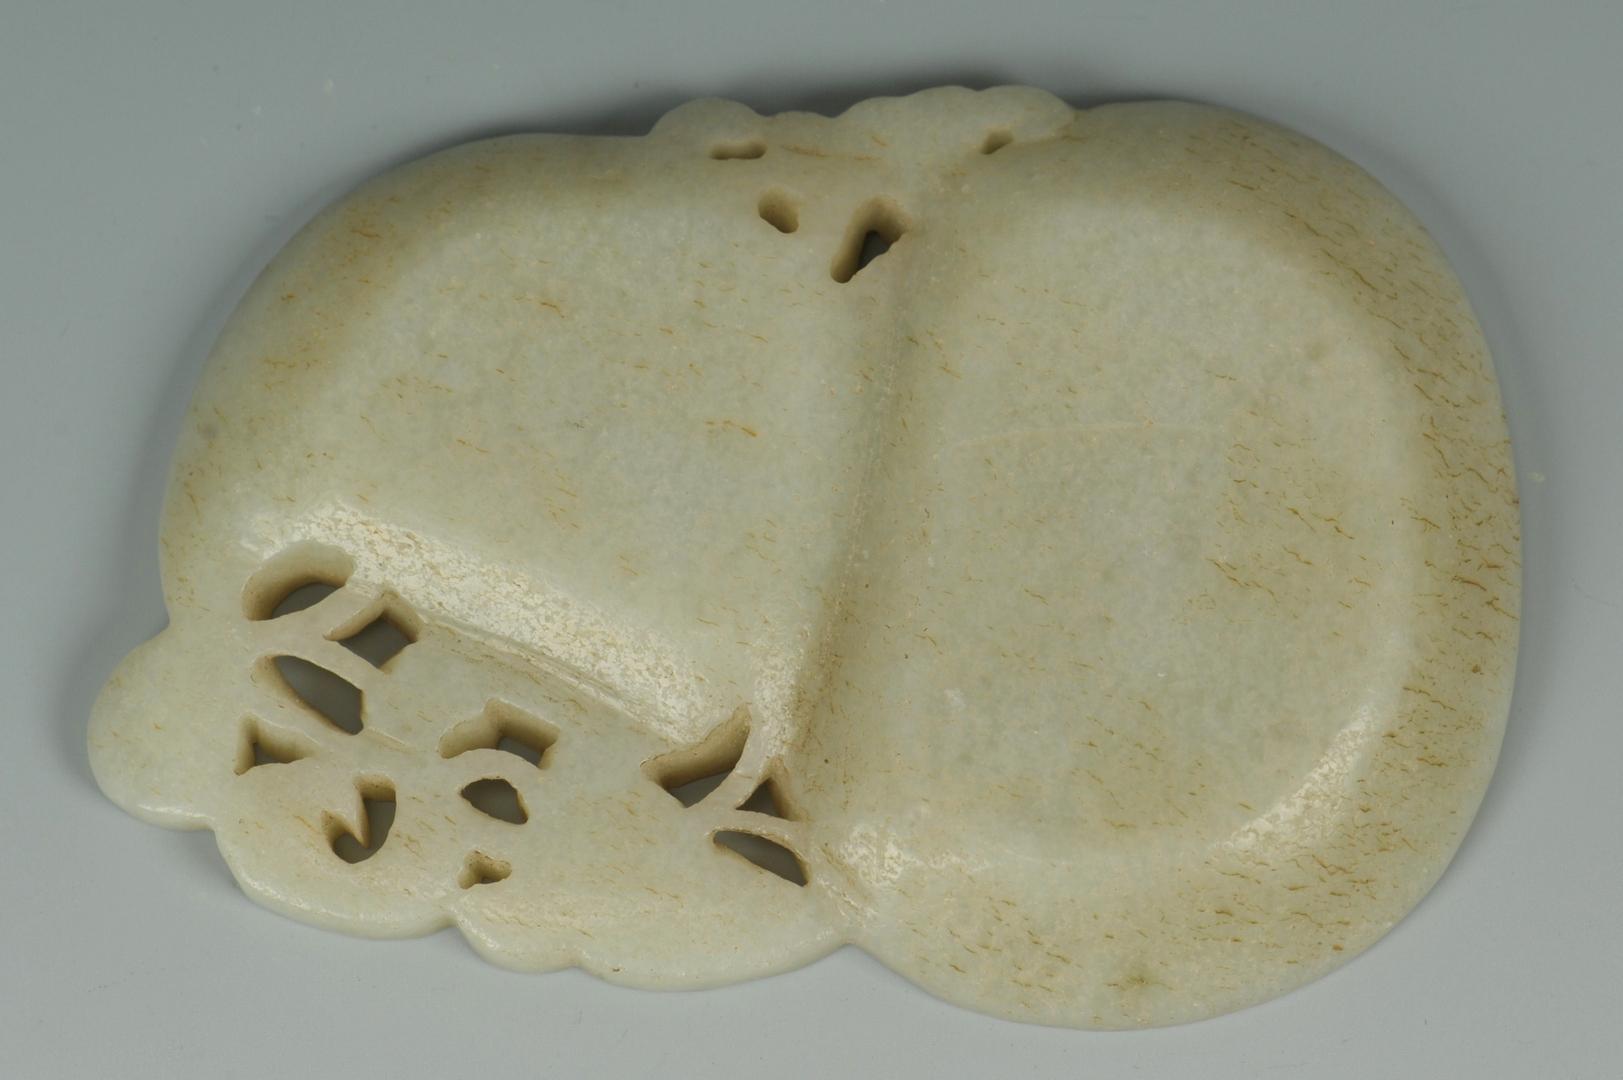 Lot 9: Chinese Carved Jade Inkstone w/ Bat & Foliage